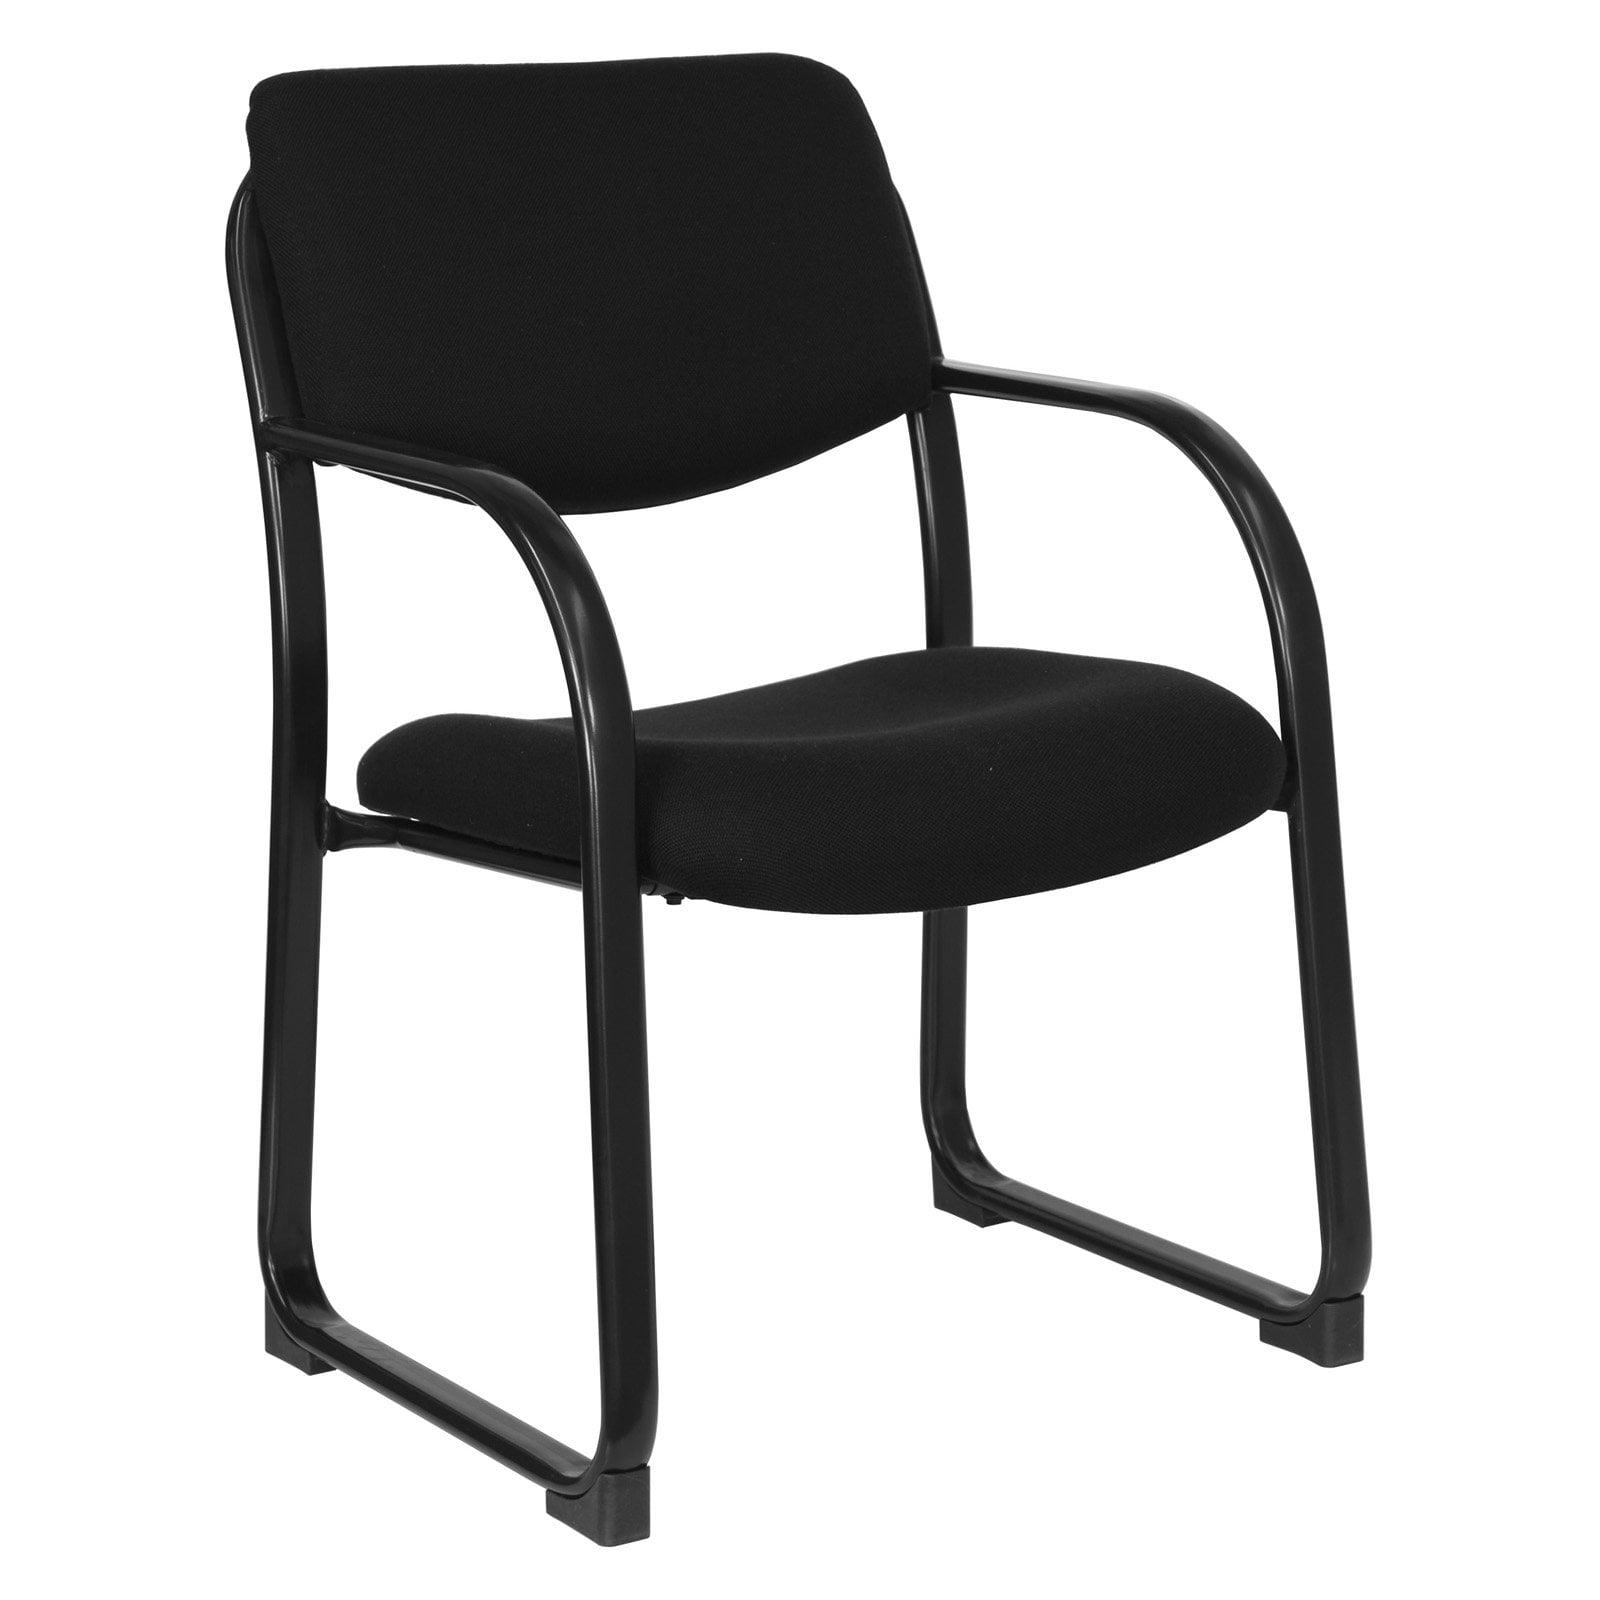 Black fabric chair - Black Fabric Chair